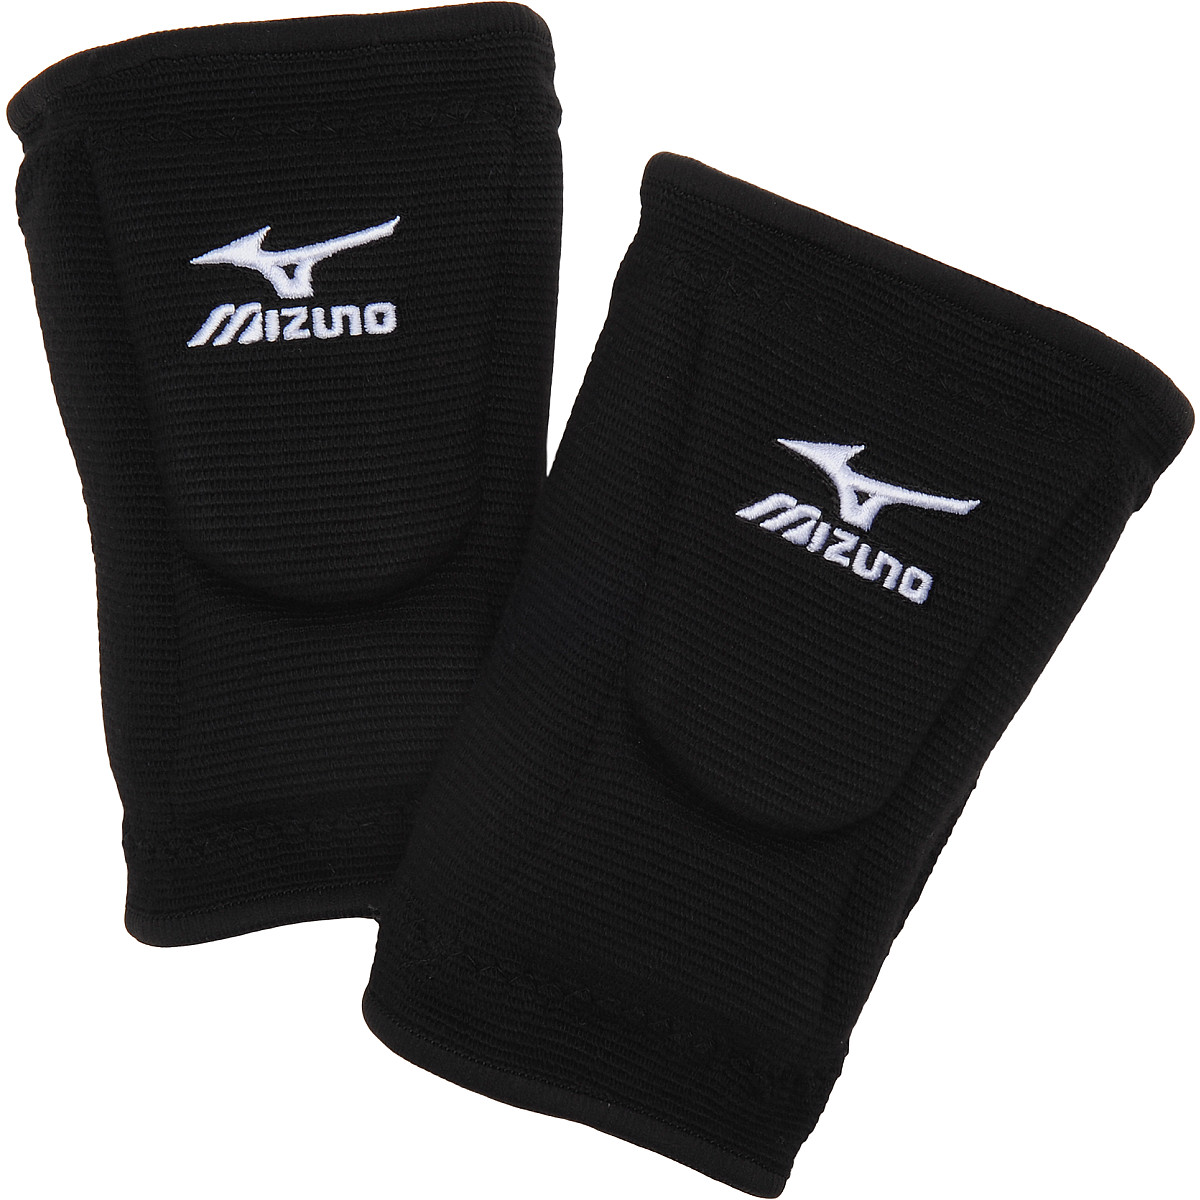 Mizuno Lr6 Knee Pad Black S L